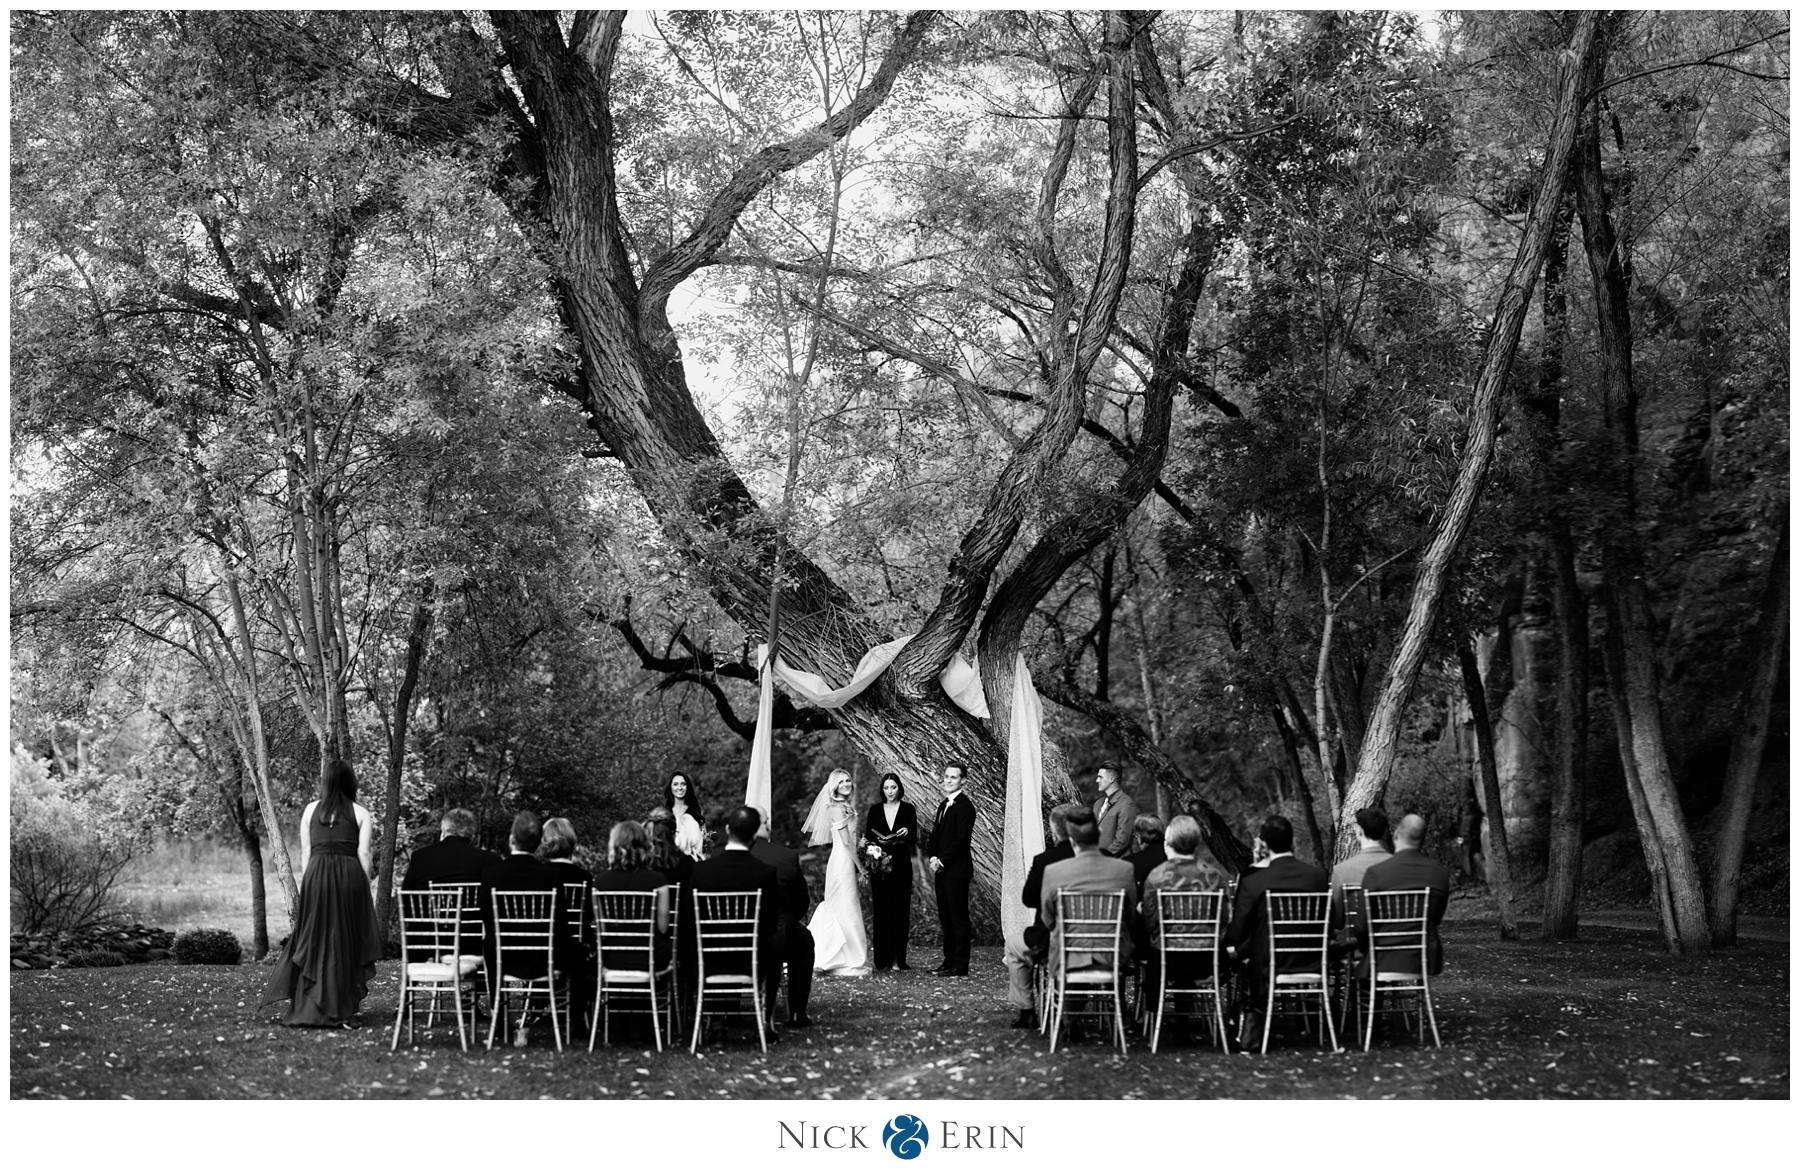 Donner_Photography_Sedona Arizona Wedding_Alissa and Tom_0045